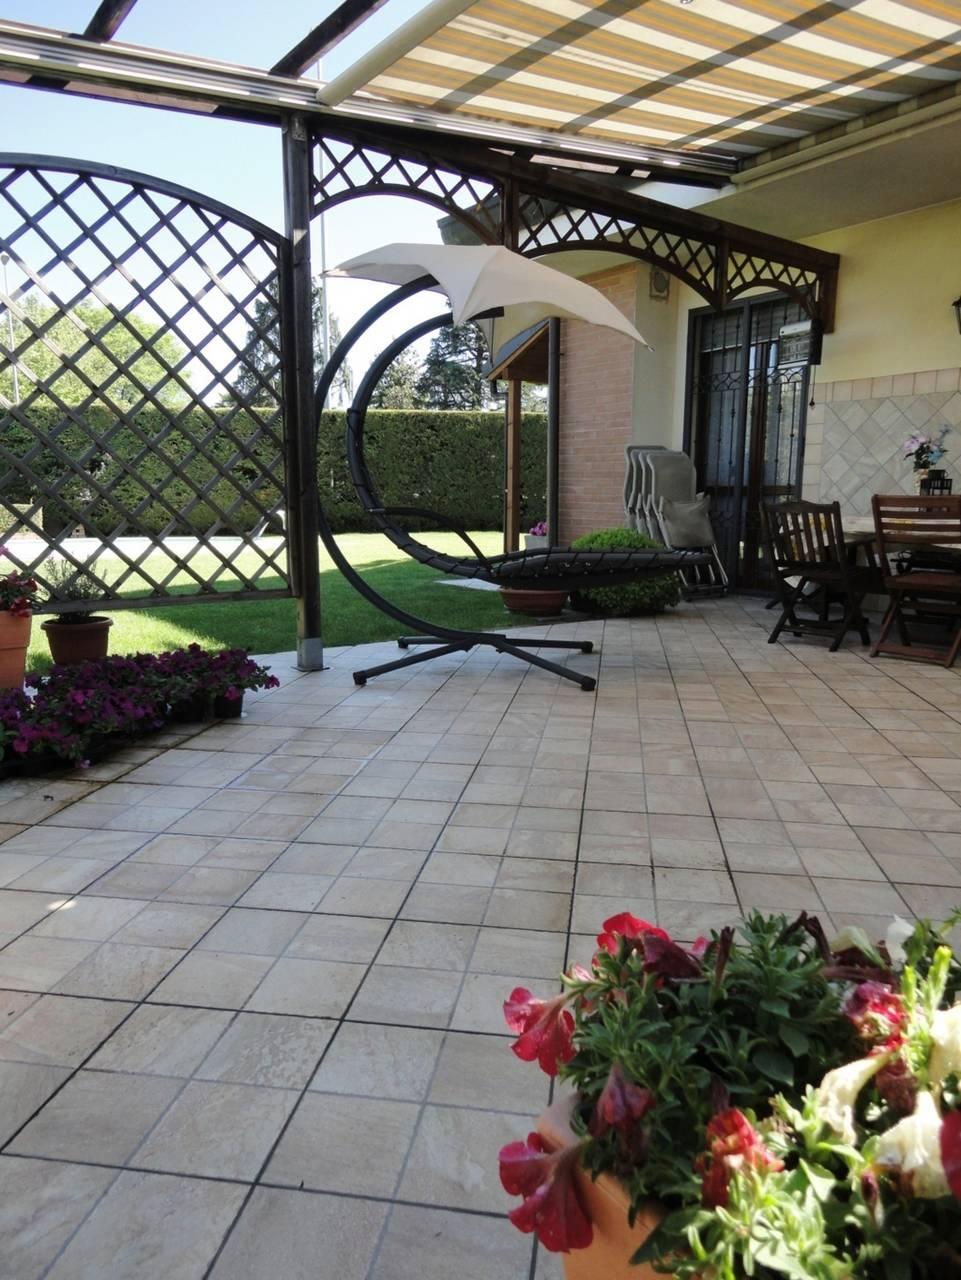 Villa-con-piscina-in-vendita-a-Busnago-in-Brianza-4